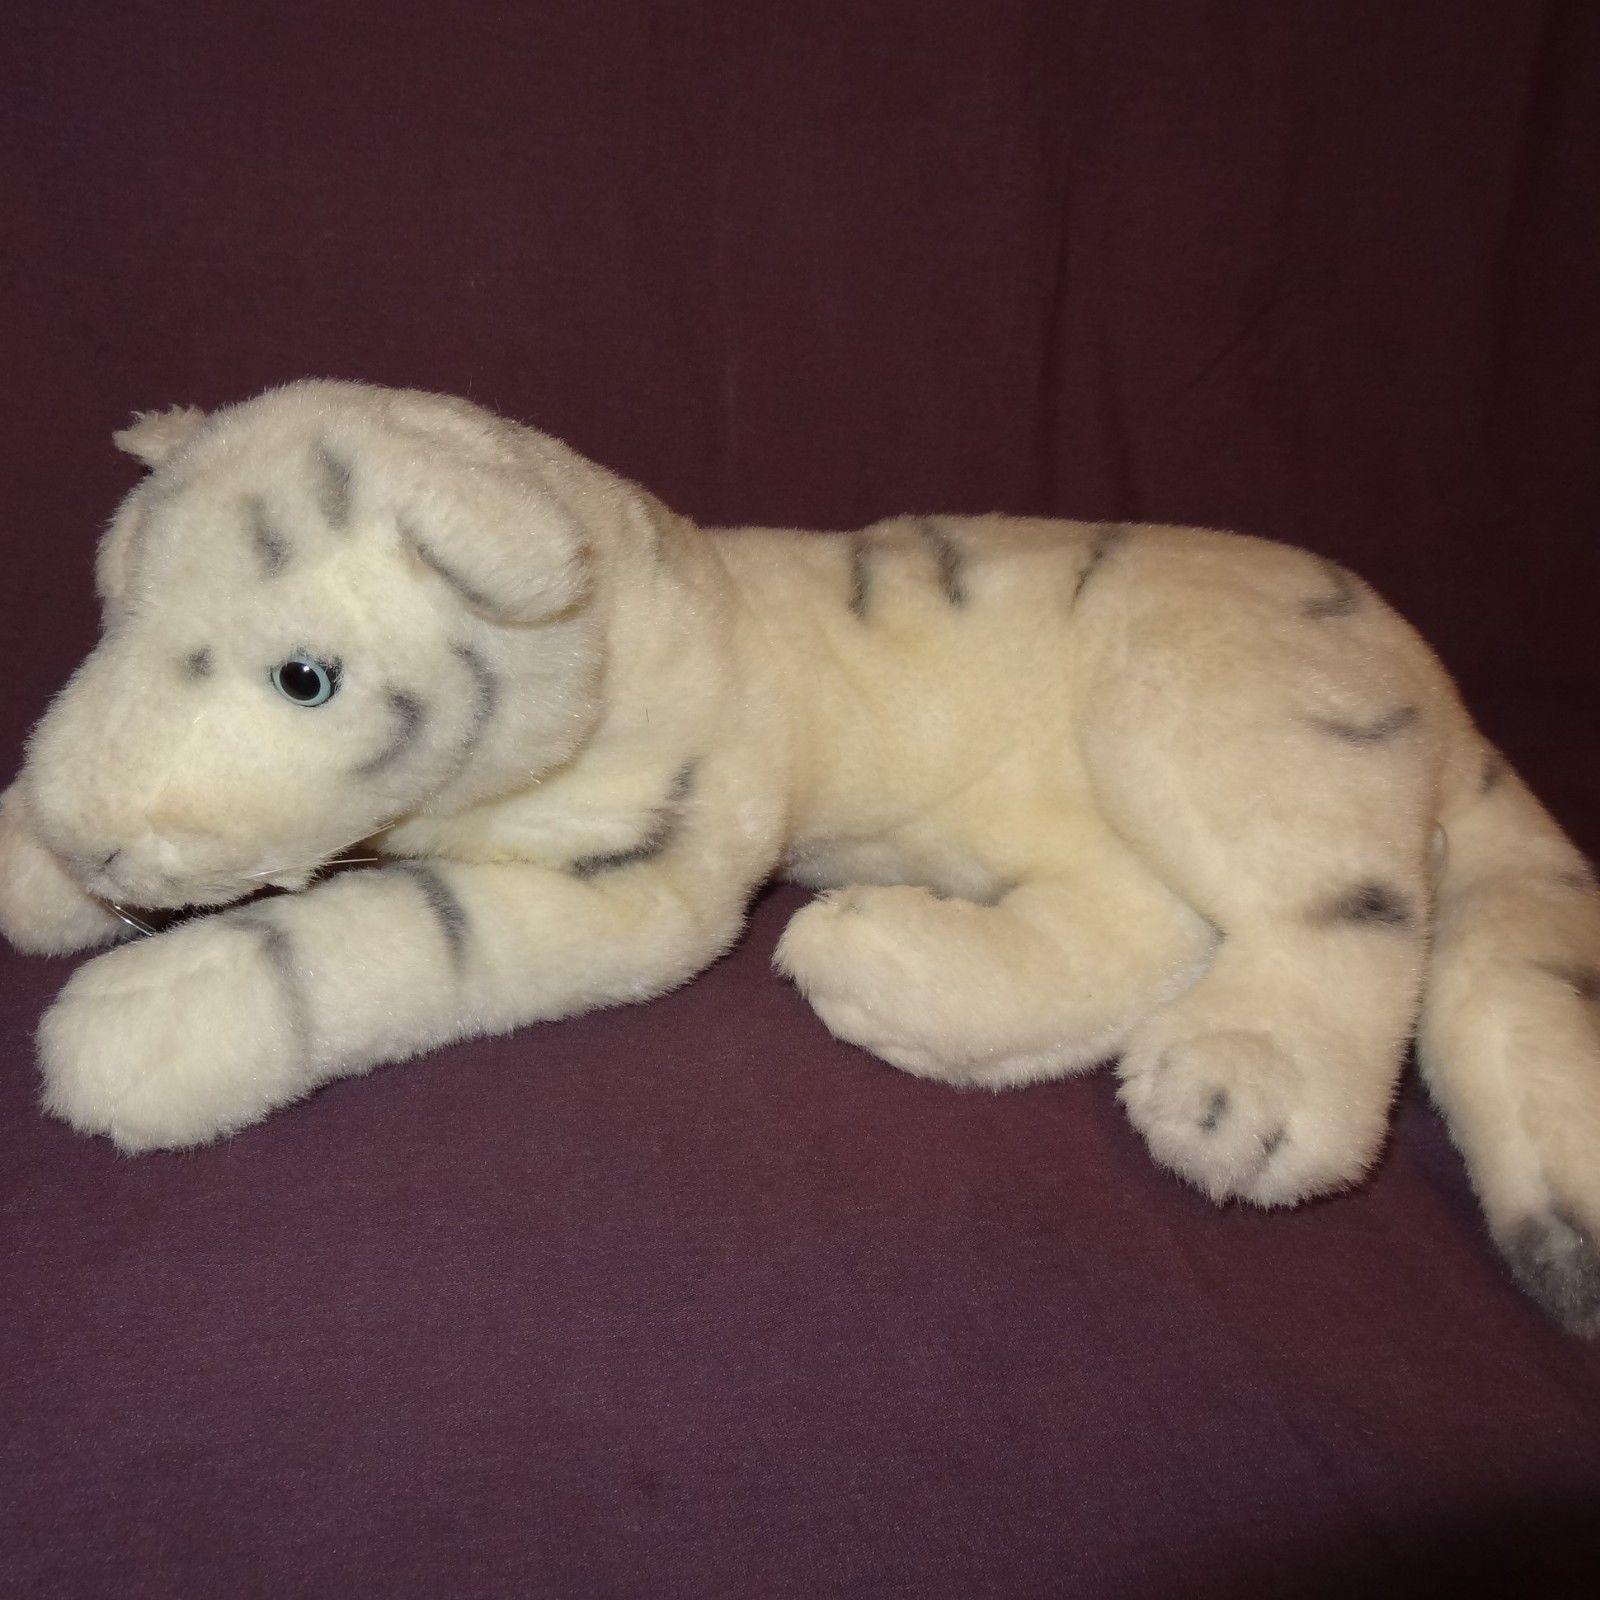 White Tiger Plush Stuffed Animal Laying 17 And 50 Similar Items